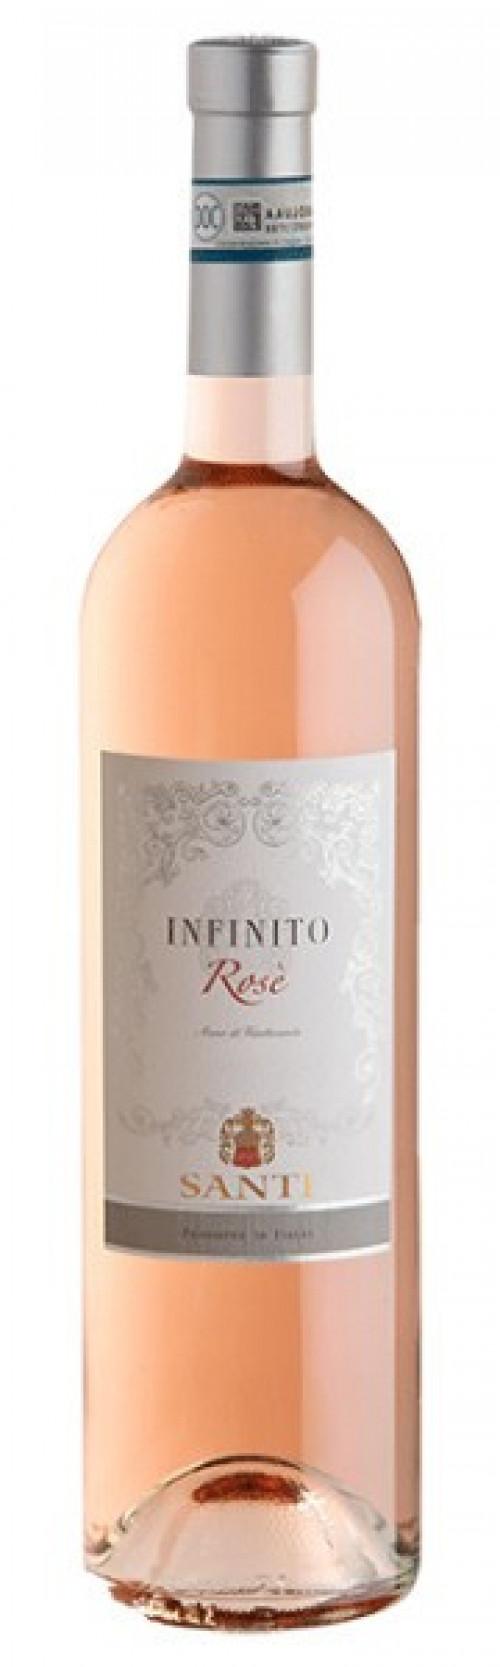 Santi Infinito Rose 750ml